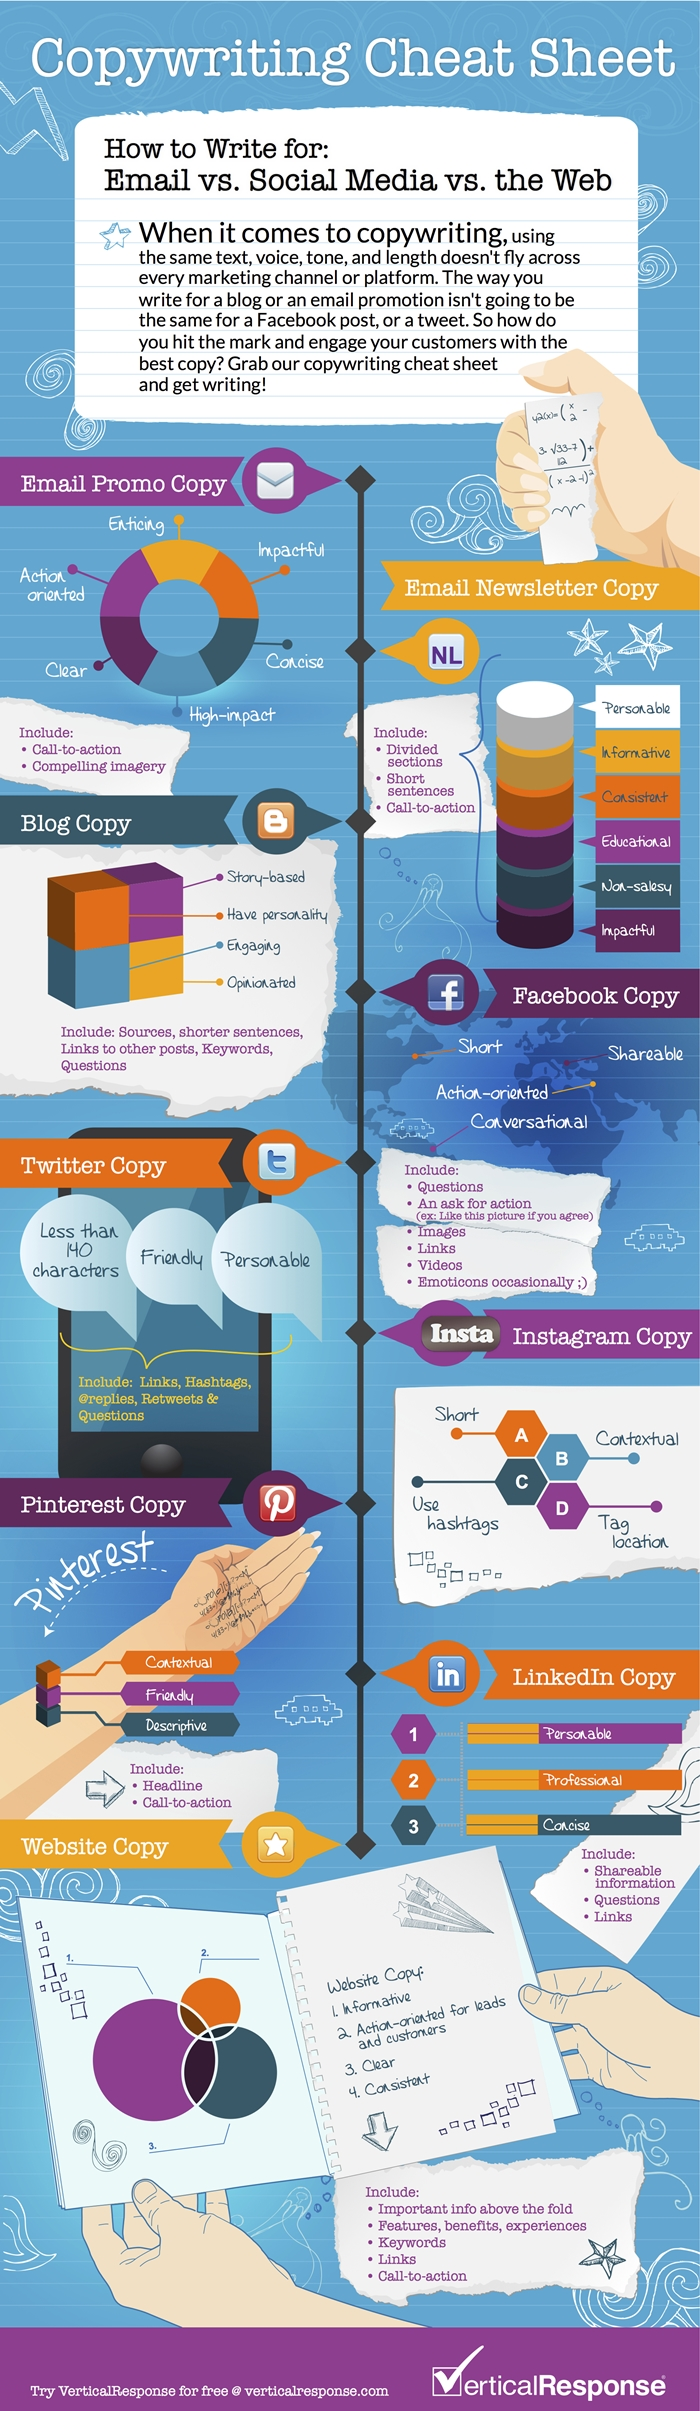 VerticalResponse-Copywriting-Cheatsheet–Infographic-700